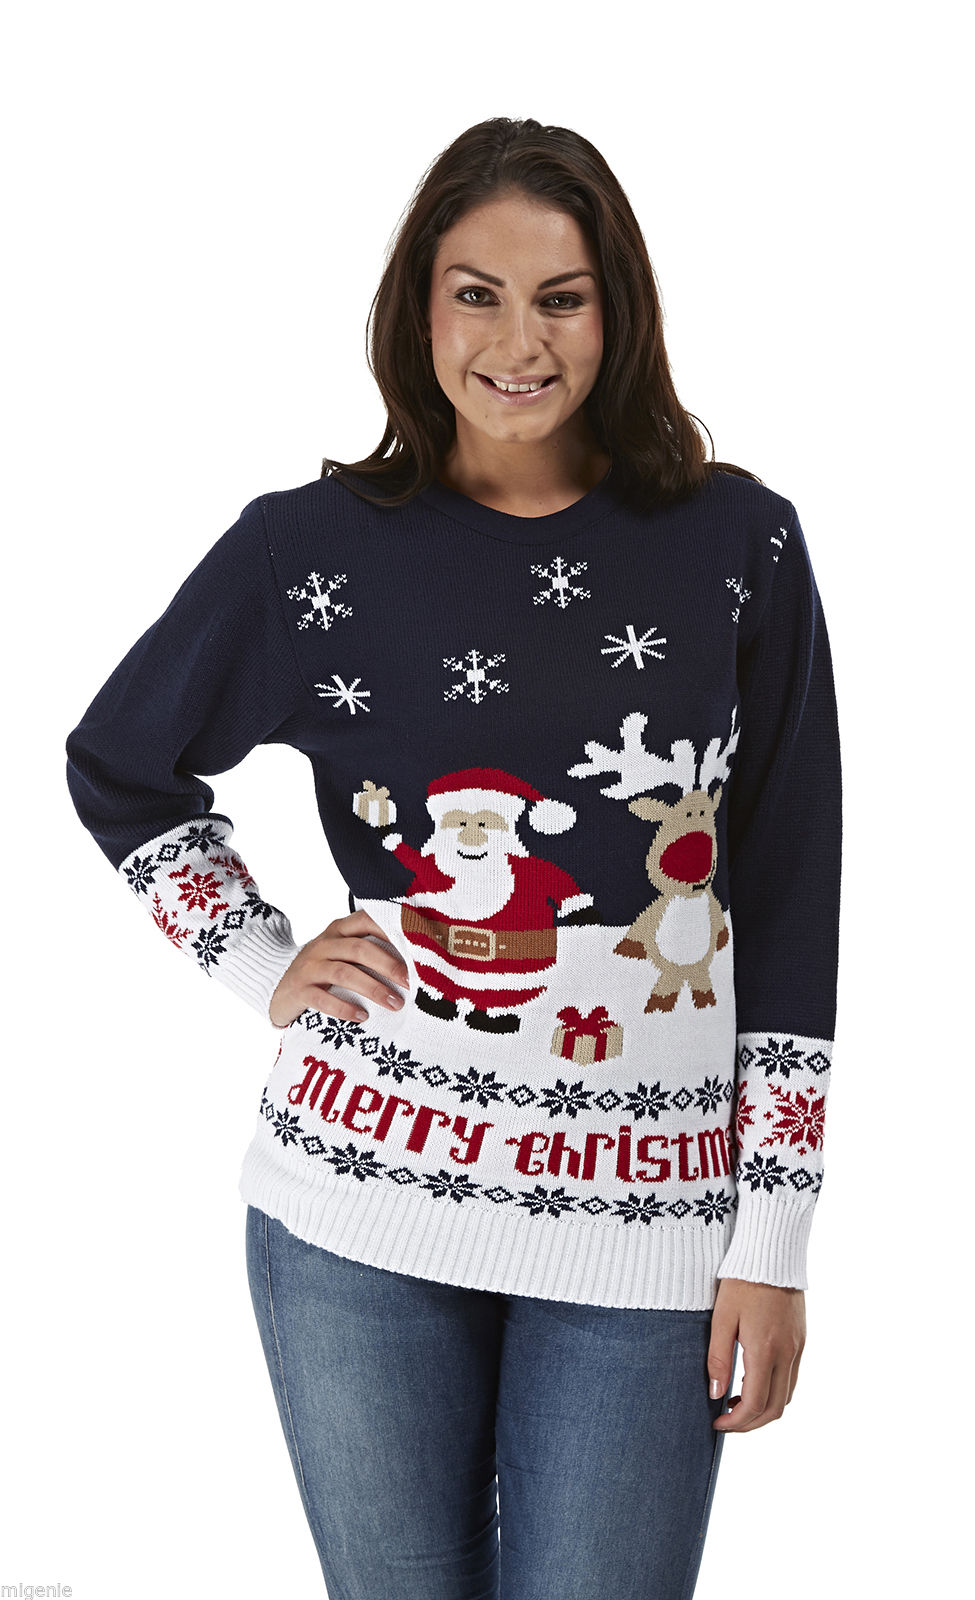 Kersttrui Kerstman.Kerstman Kado Foute Kersttrui Kopen Grootste Aanbod Kersttruien